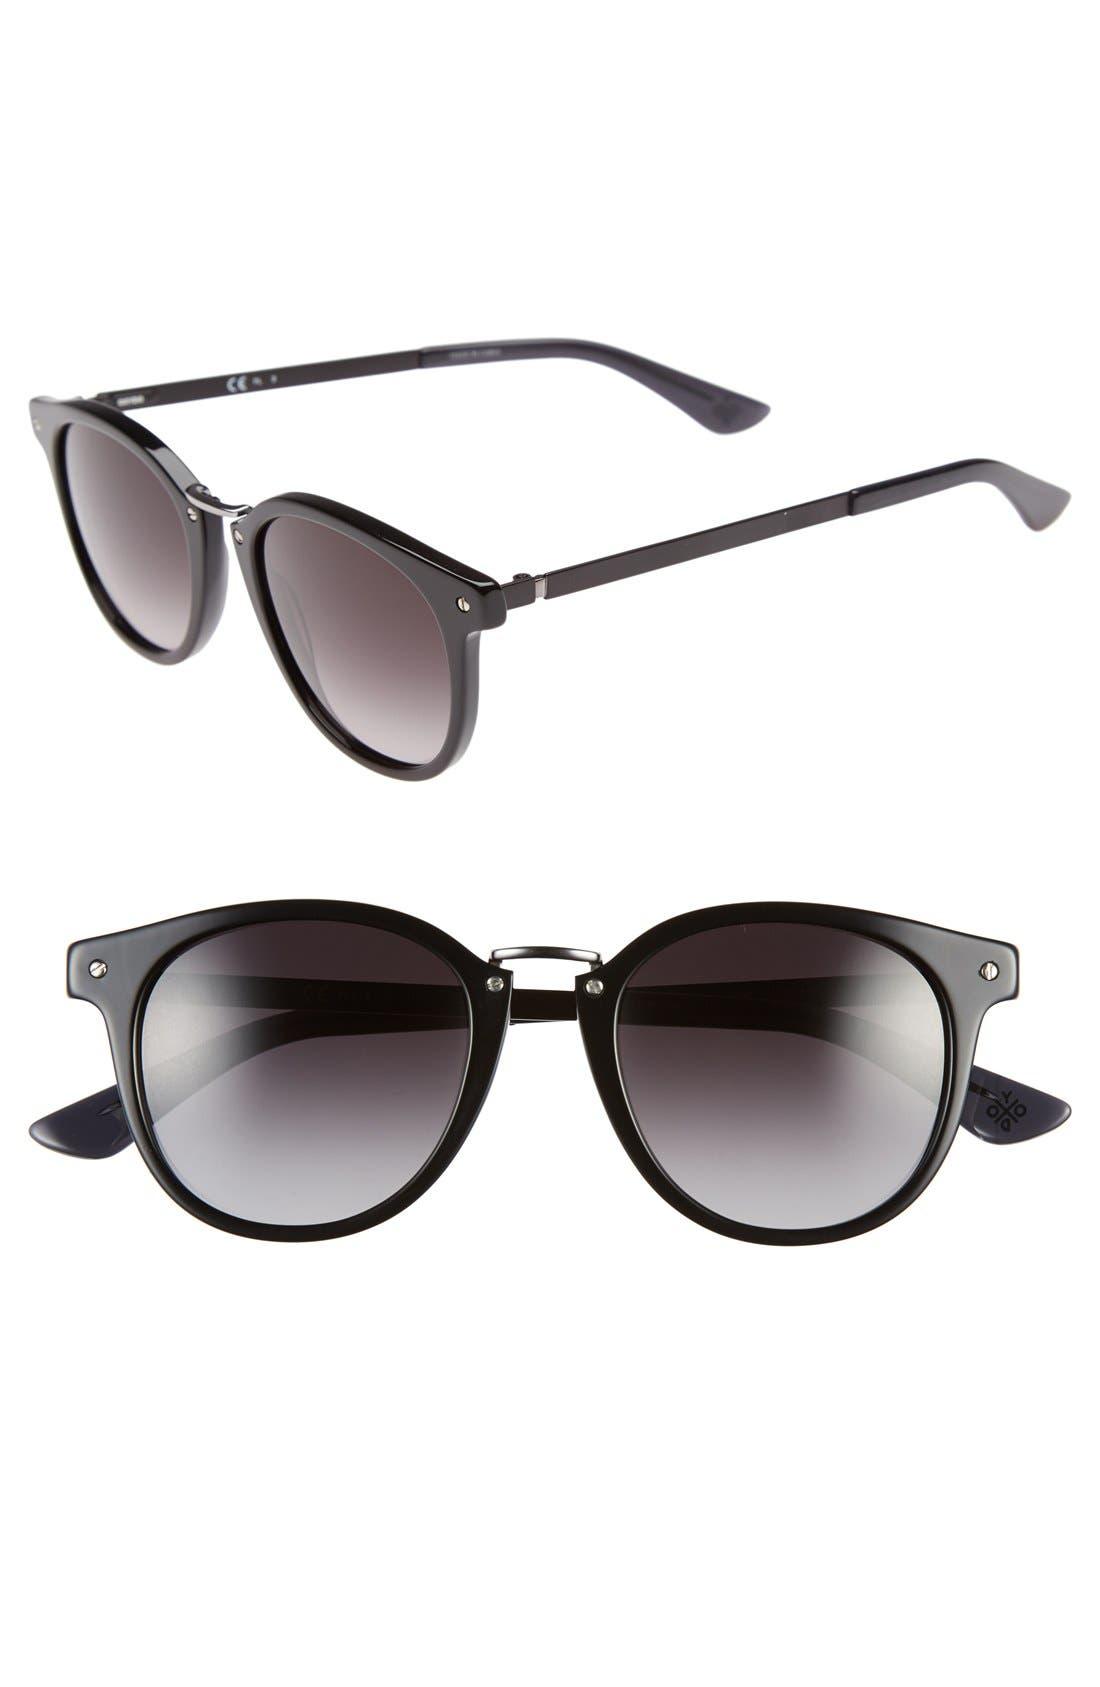 Main Image - Oxydo 49mm Round Metal Accent Sunglasses